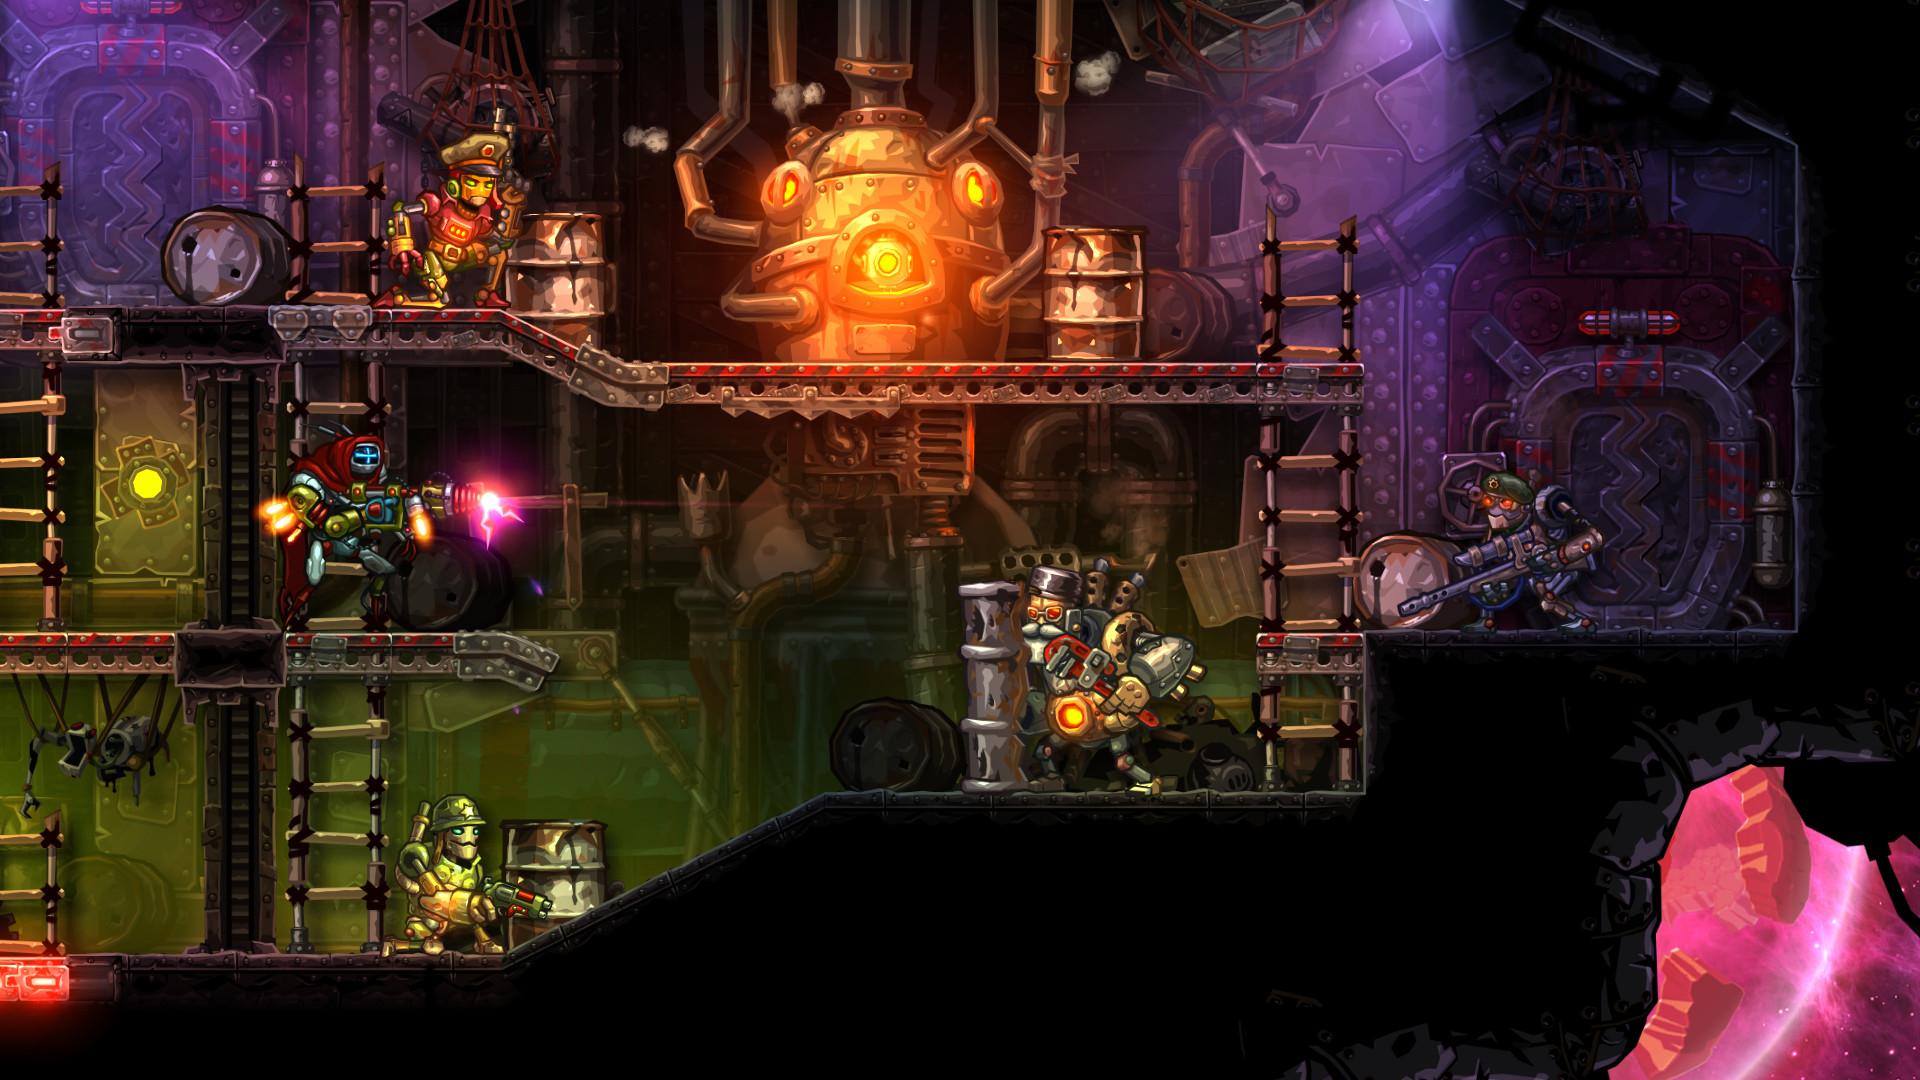 SteamWorld Heist: The Outsider screenshot